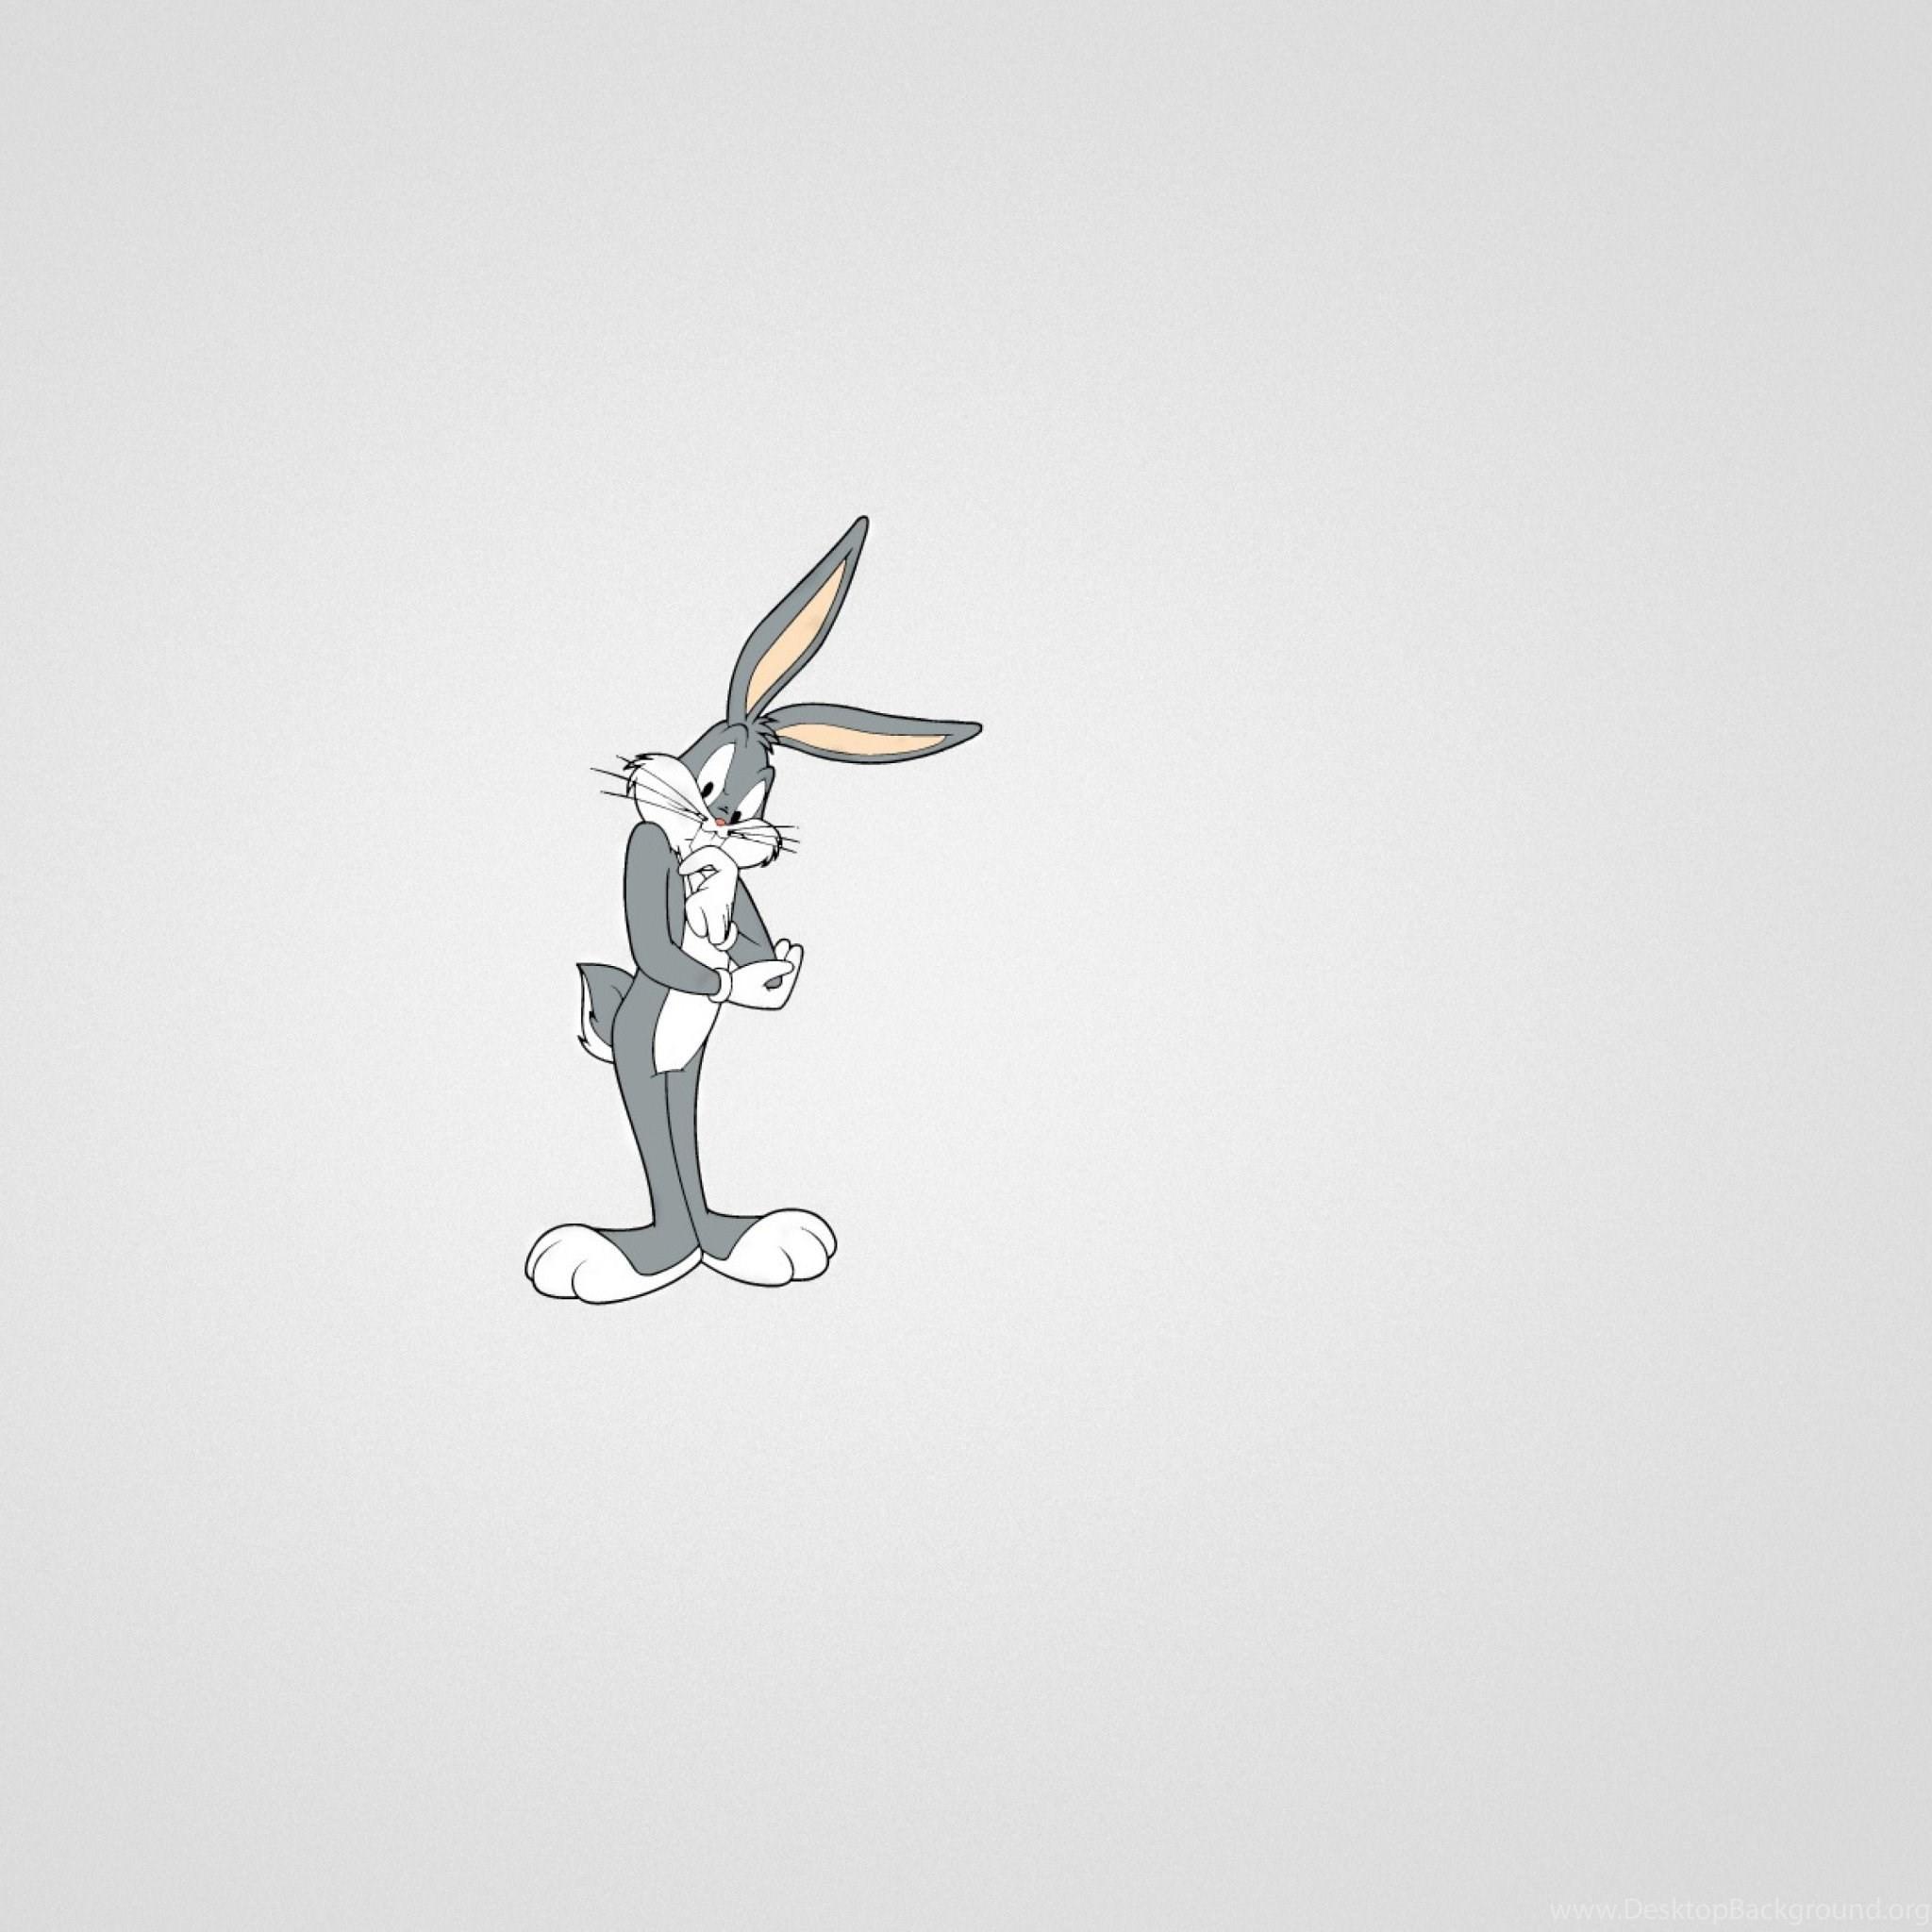 Bugs Bunny Wallpapers Wallpapertag